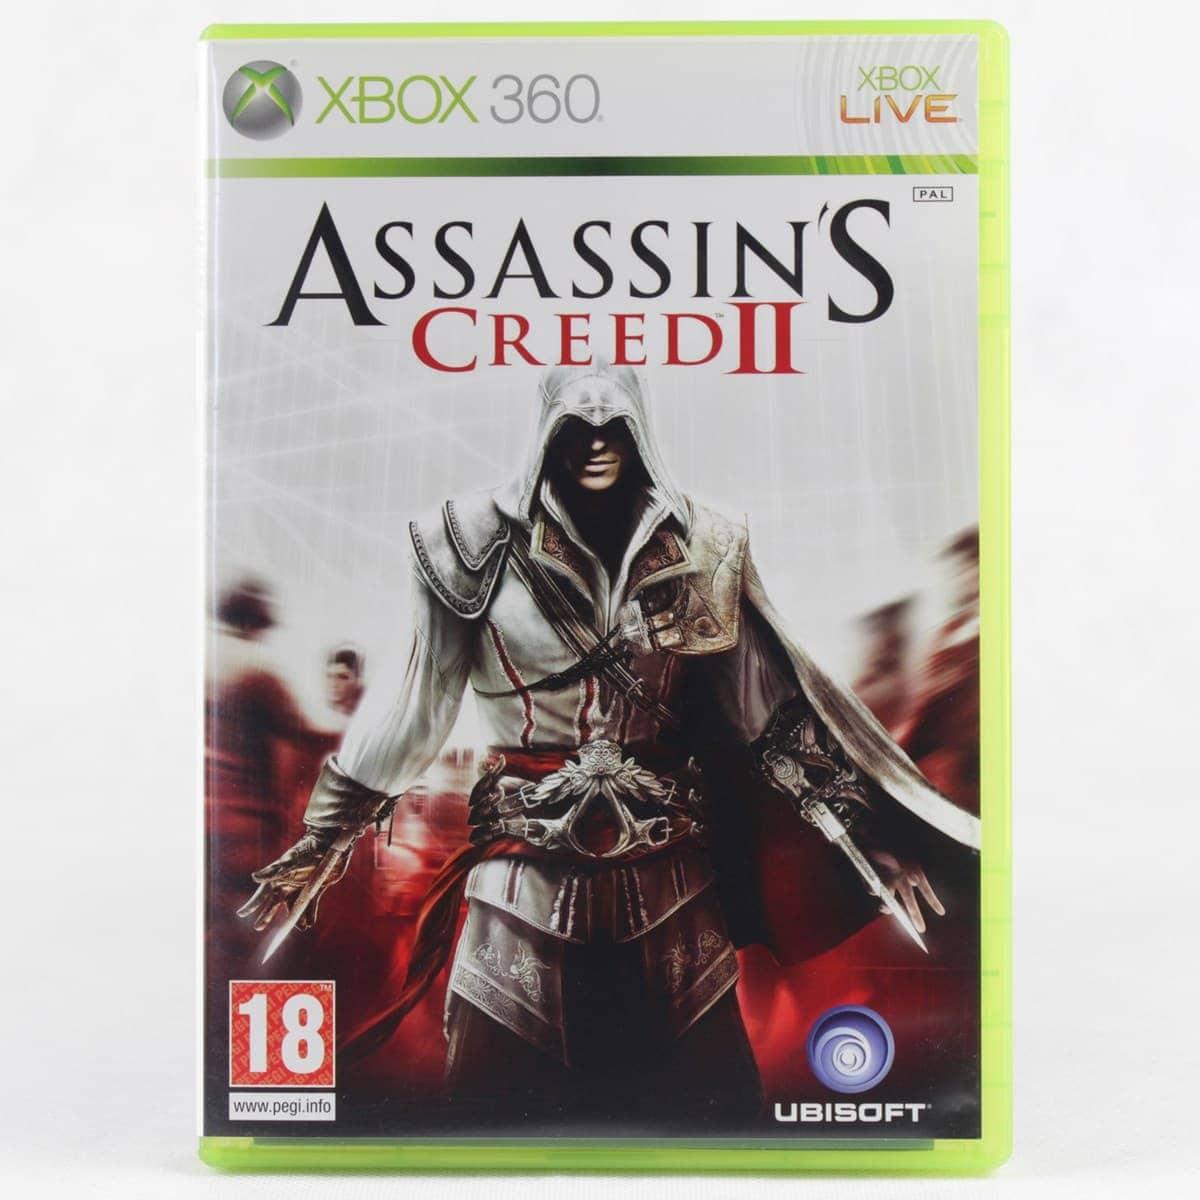 Assassin's Creed II (Xbox 360)